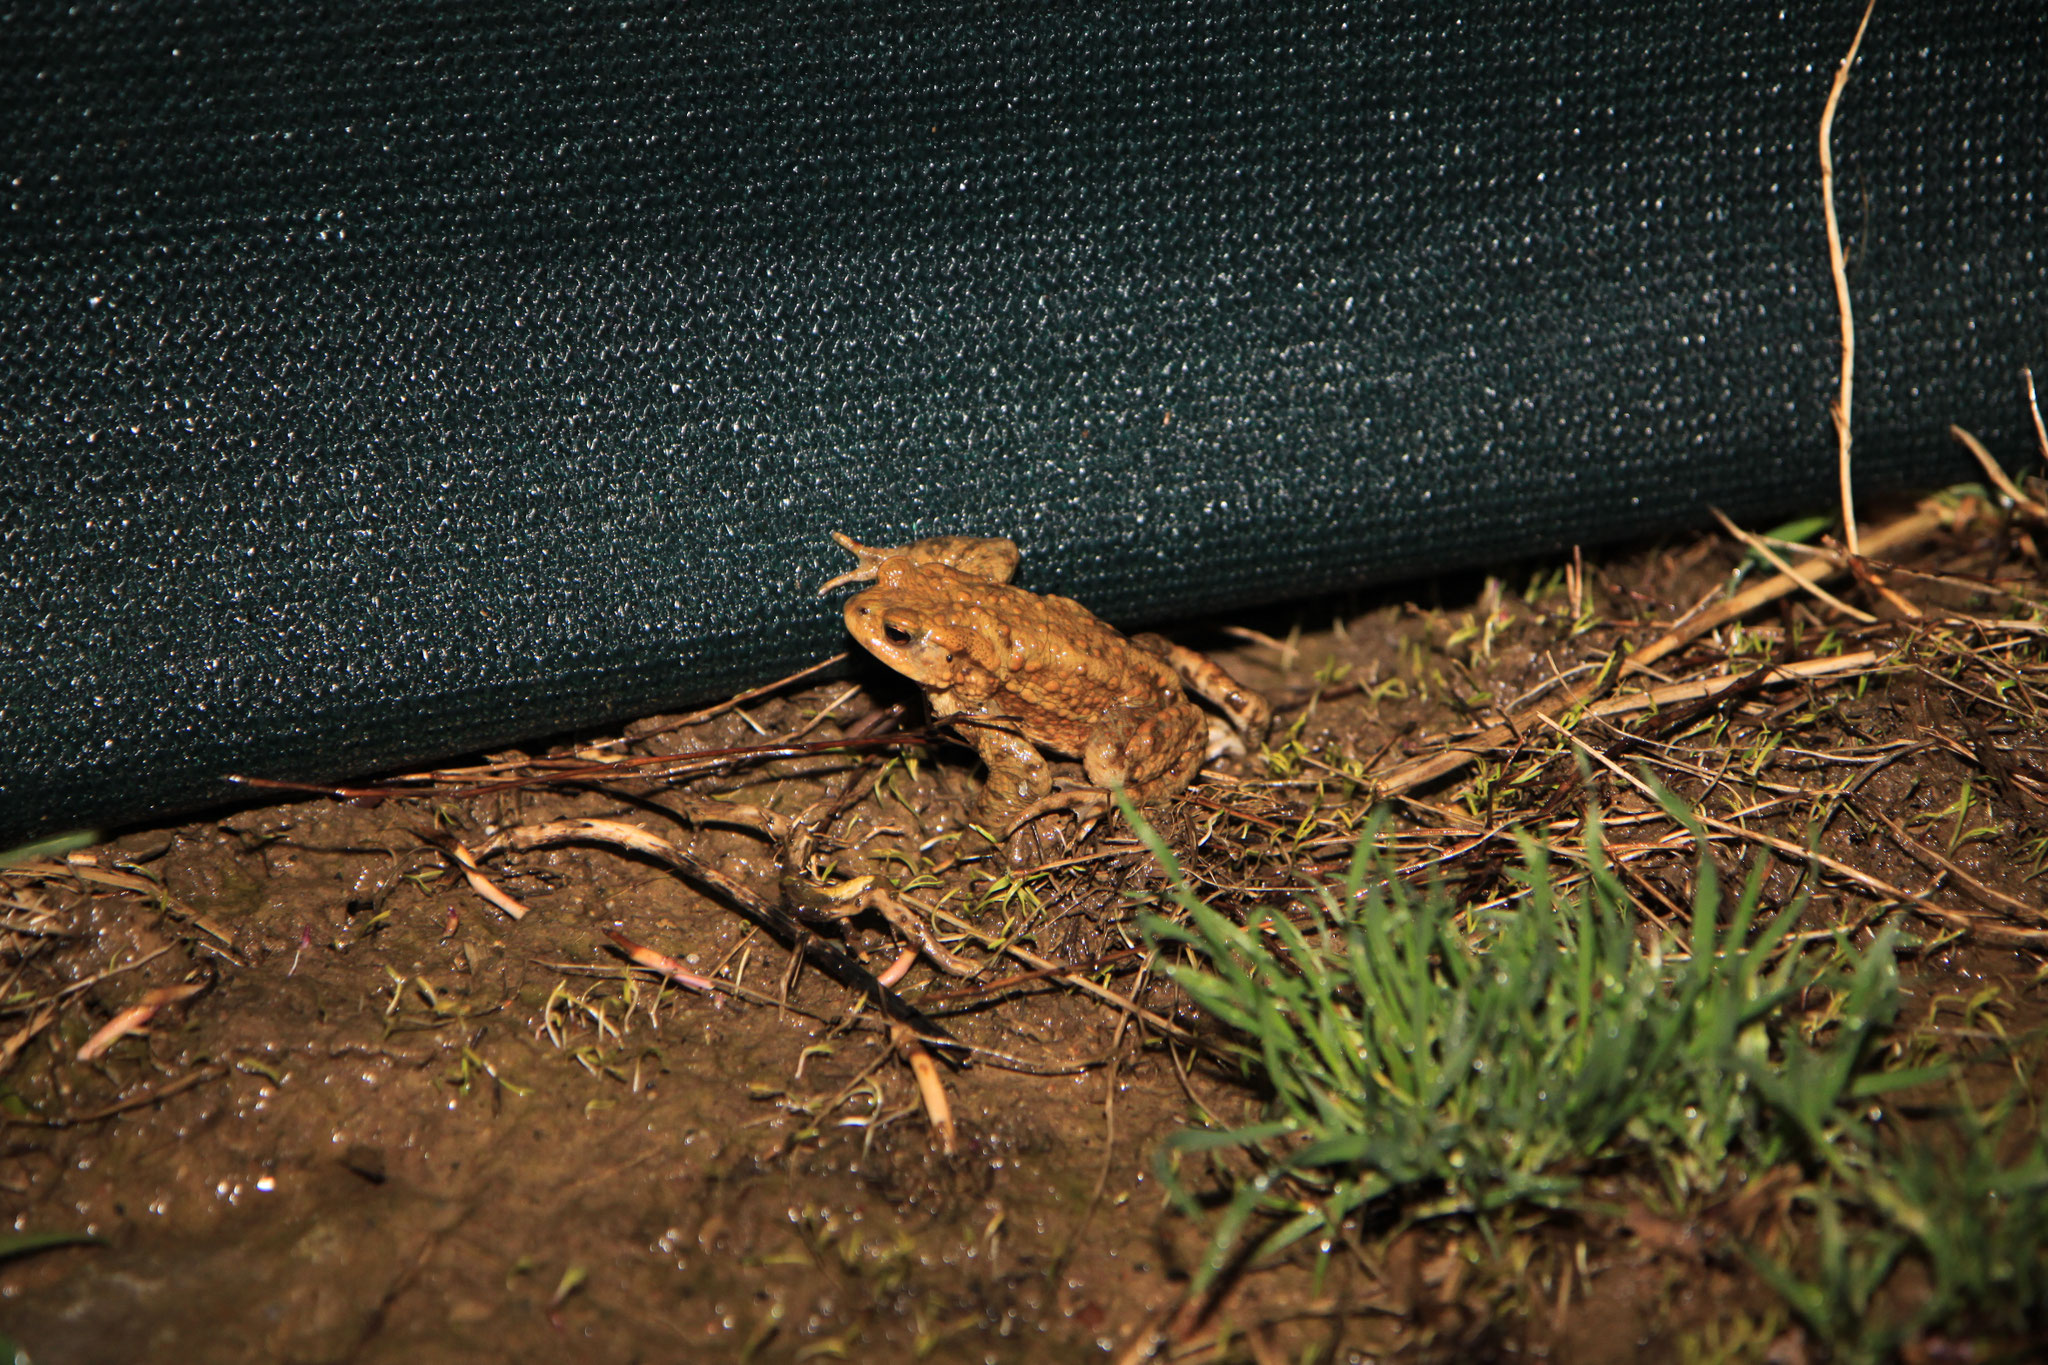 Die Erdkröten sind nun auf dem Rückweg (Foto: B. Budig)